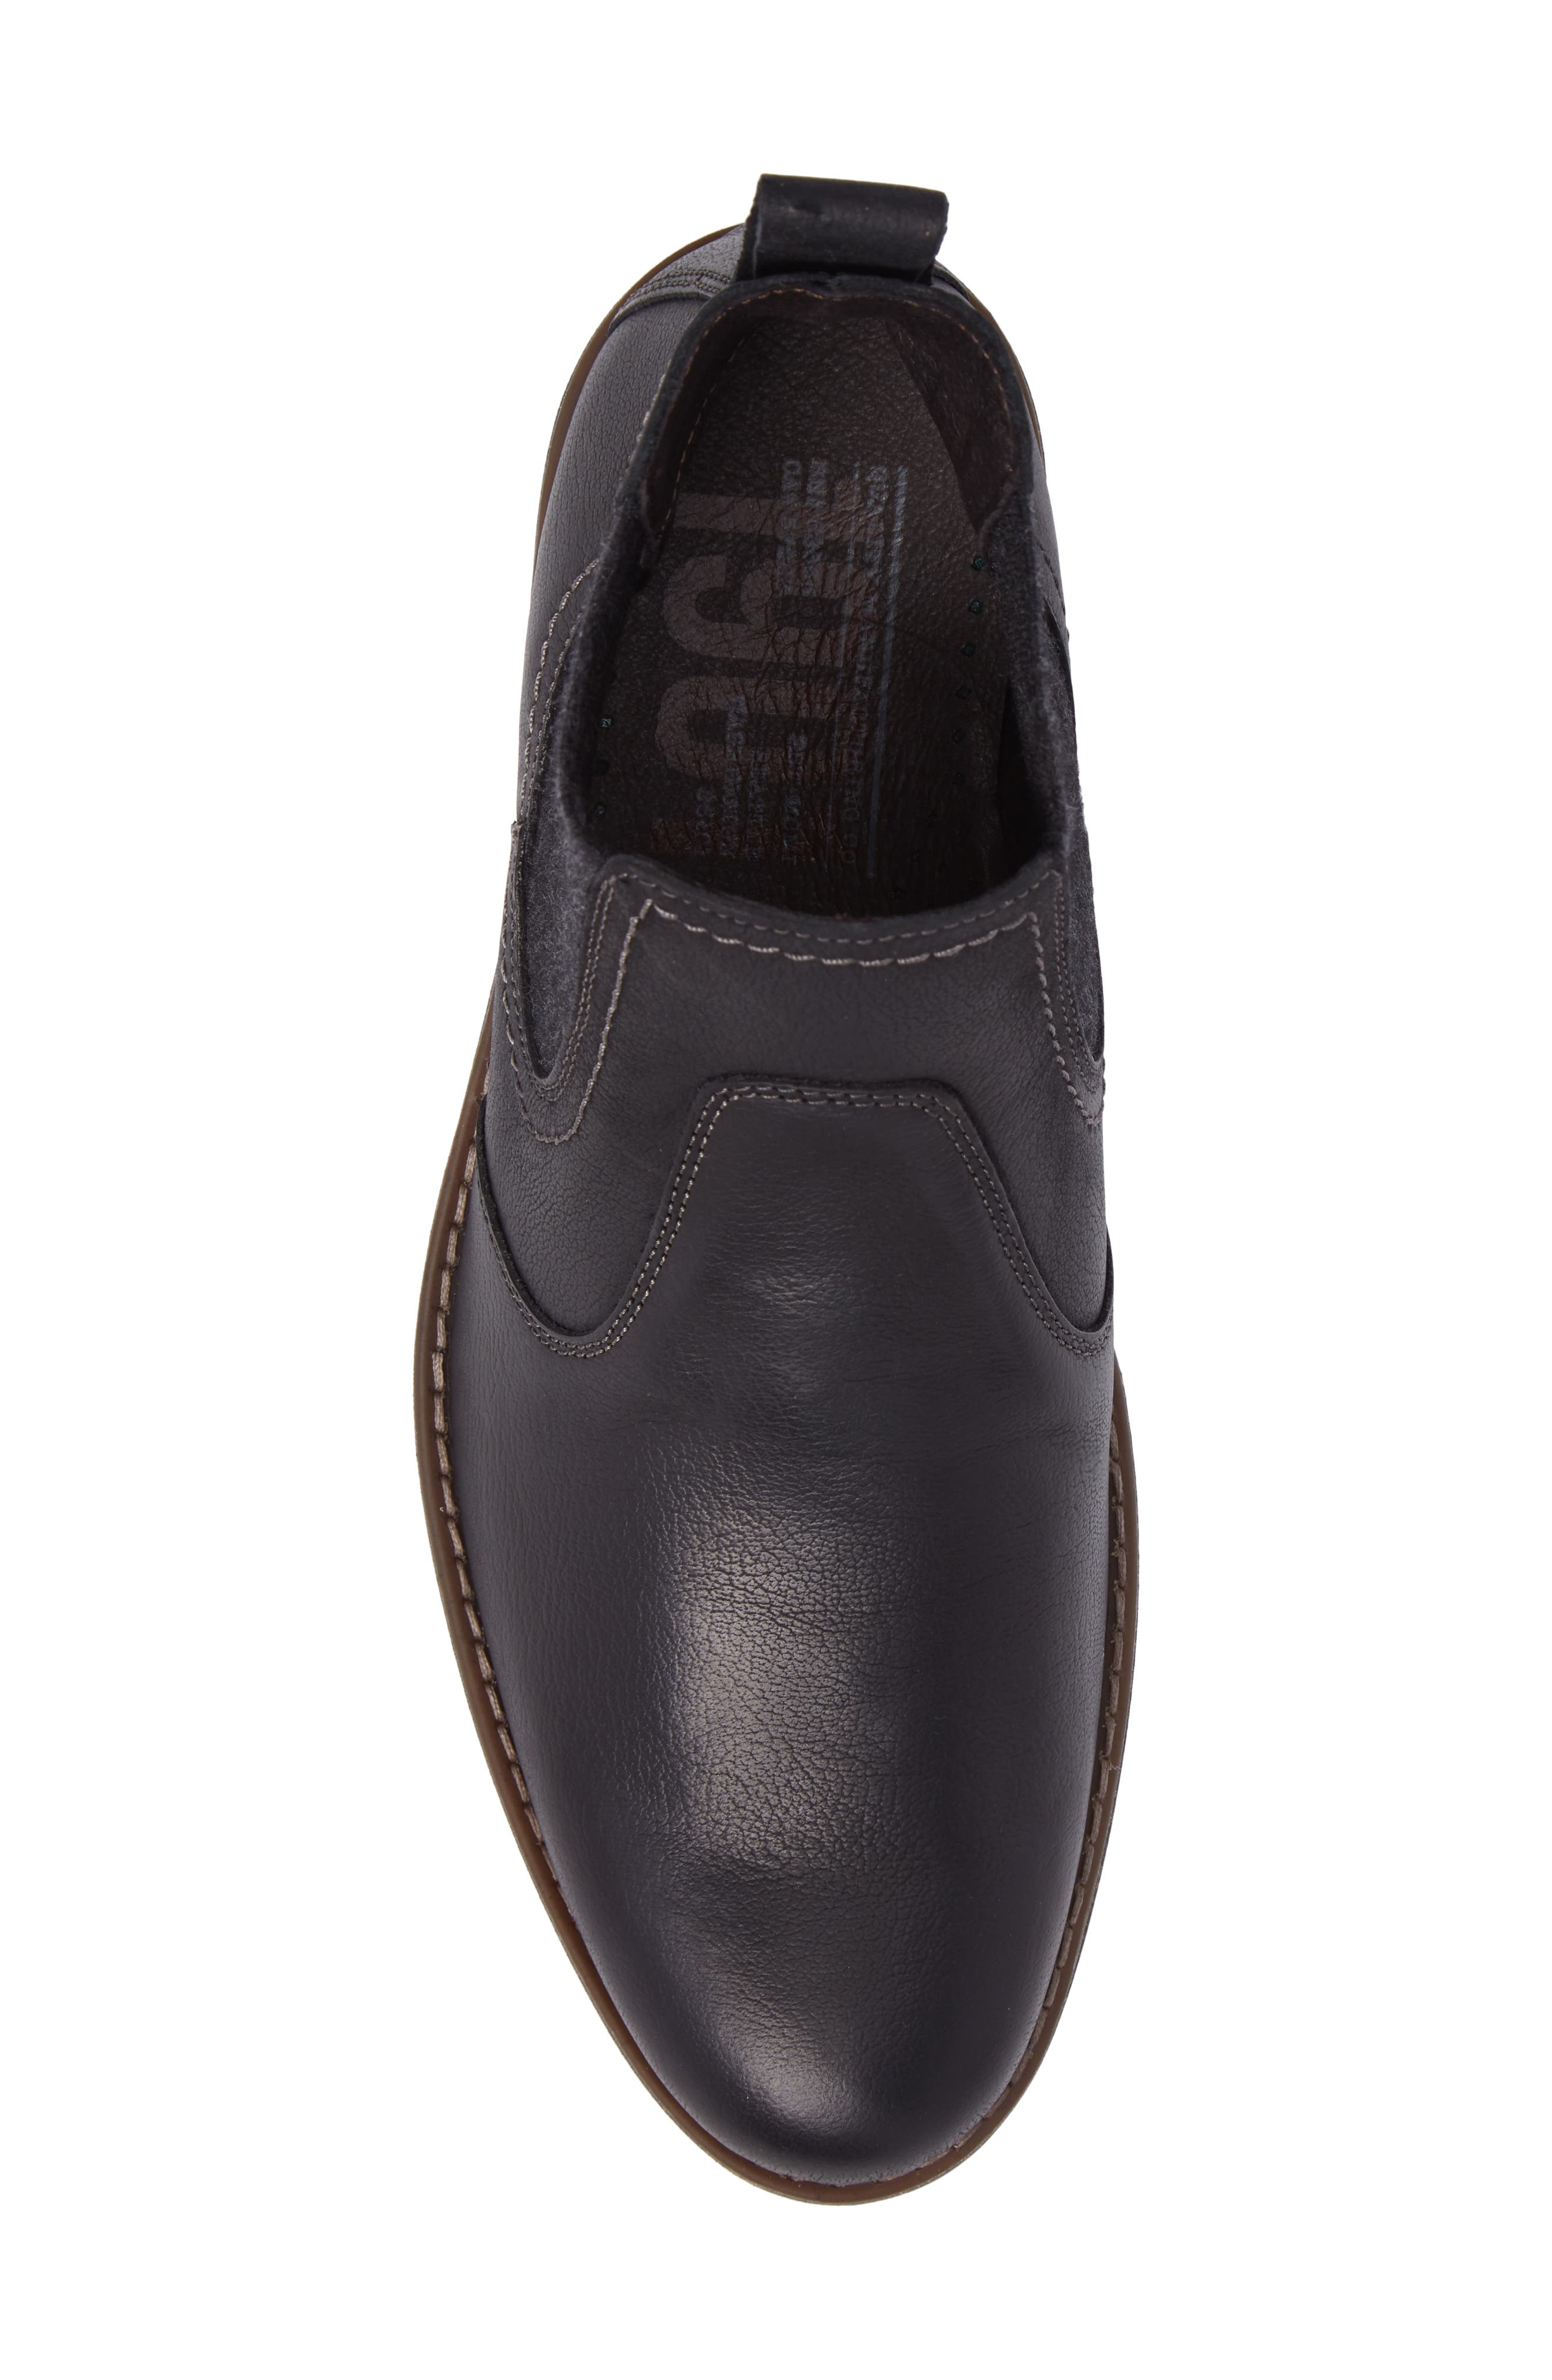 Spokane Chelsea Boot,                             Alternate thumbnail 5, color,                             Black Leather